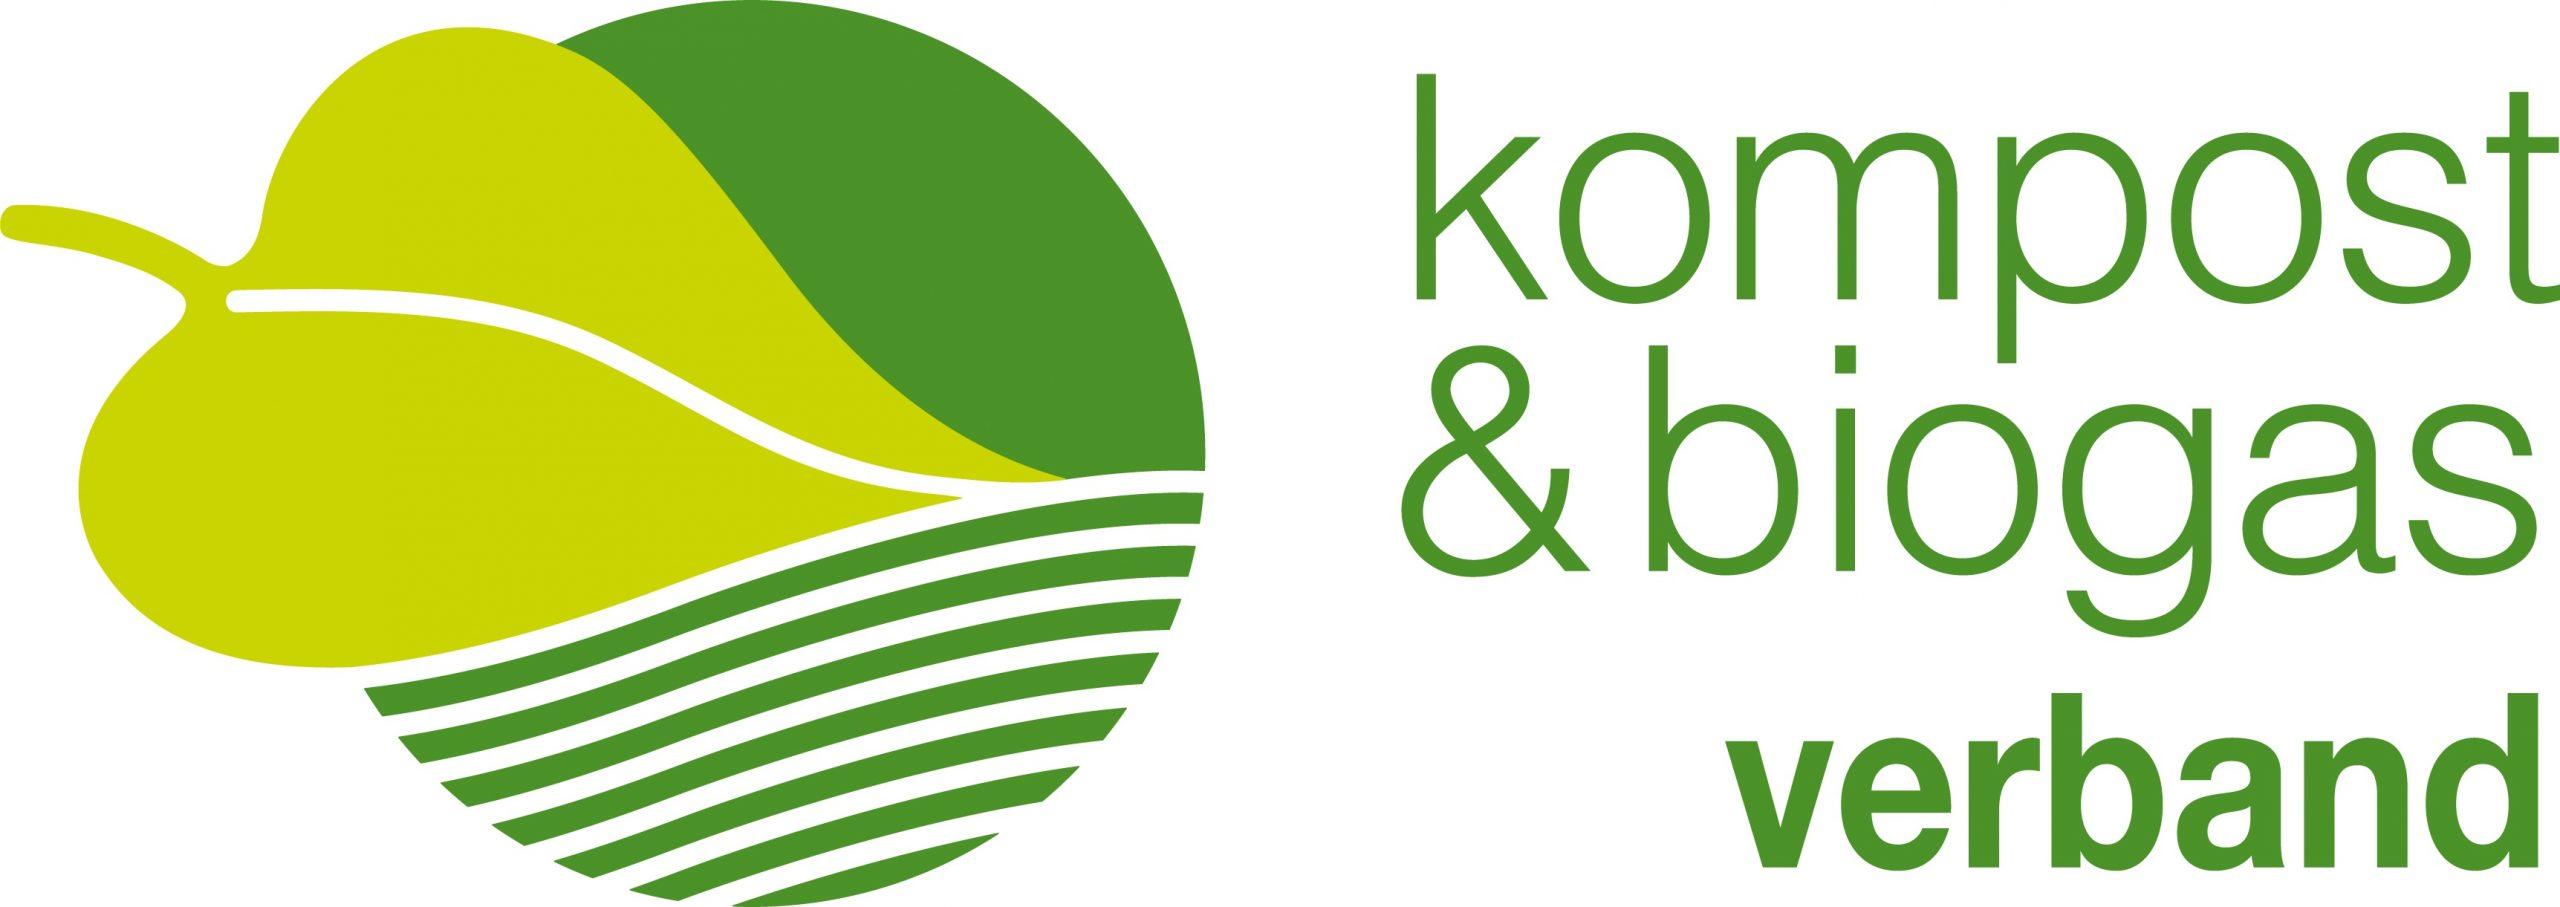 https://europeanplasticspact.org/wp-content/uploads/2021/08/2020-01-01-logo_verband_kb-scaled.jpg